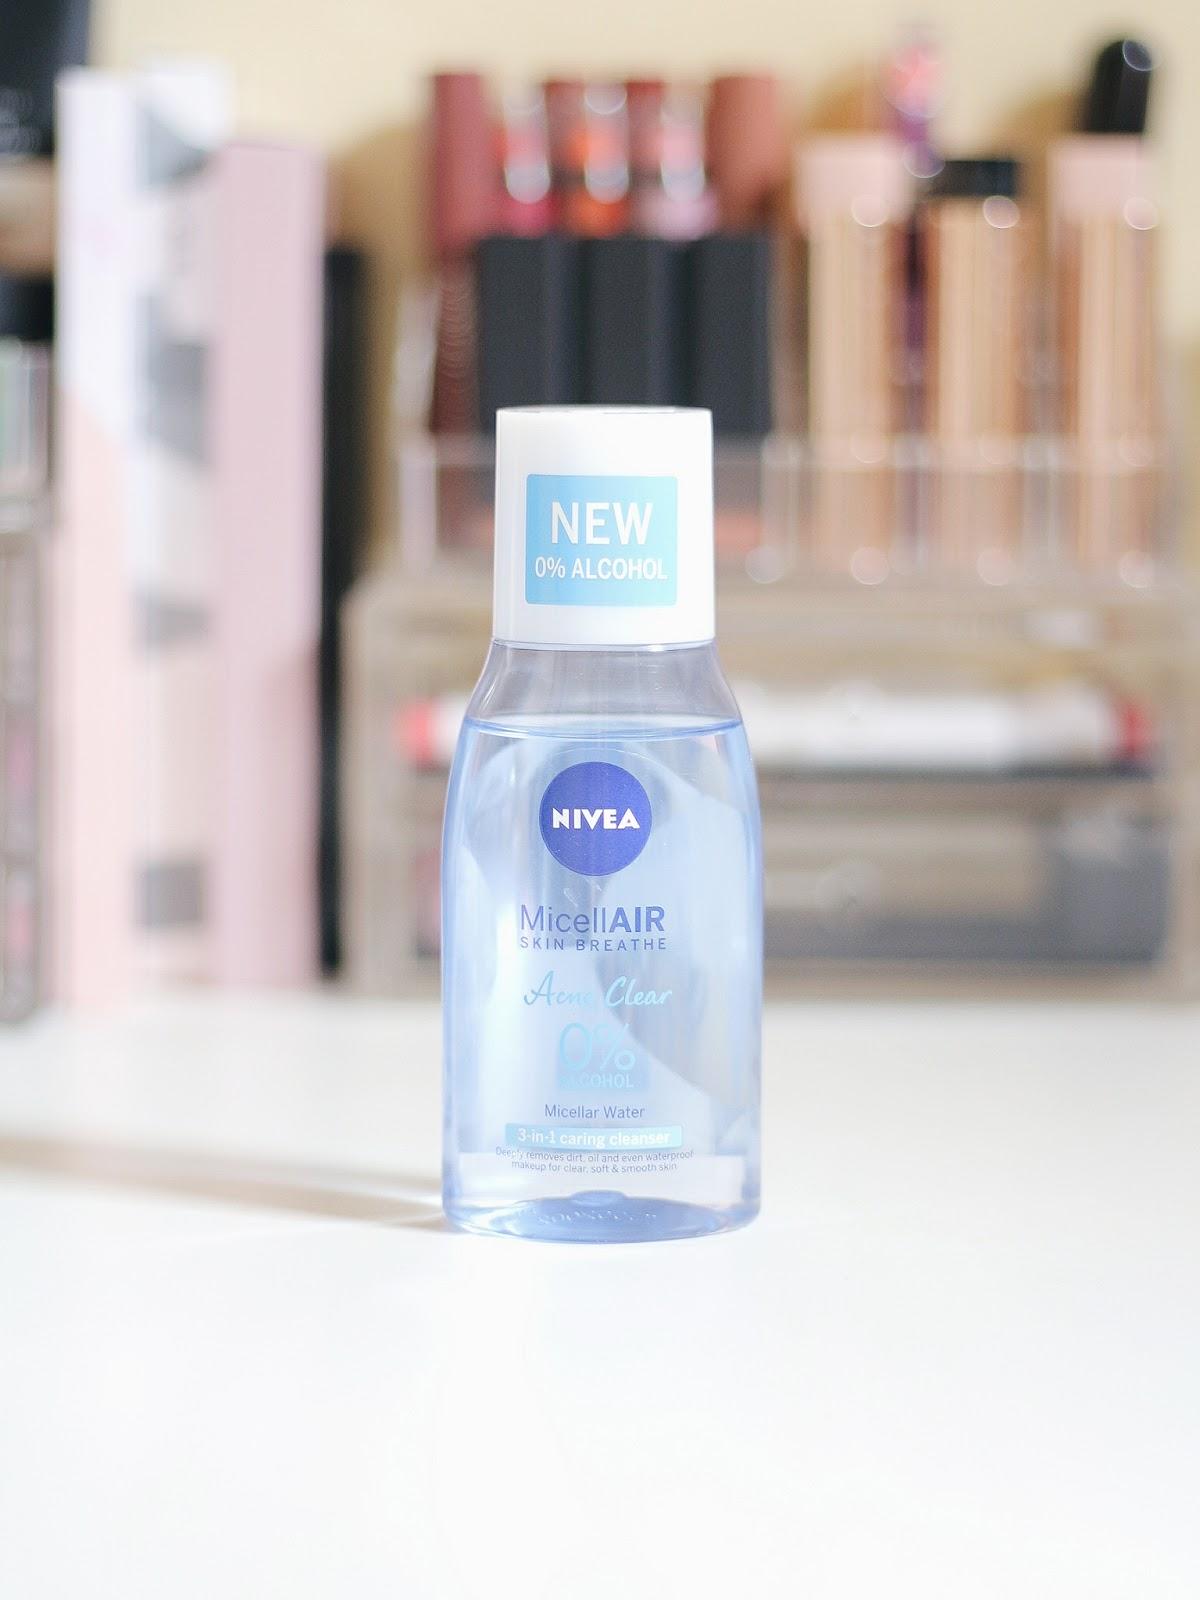 Nivea Micellair Review Acne Clear Makeup In Manila L Oreal Micellar Water 250ml Blue